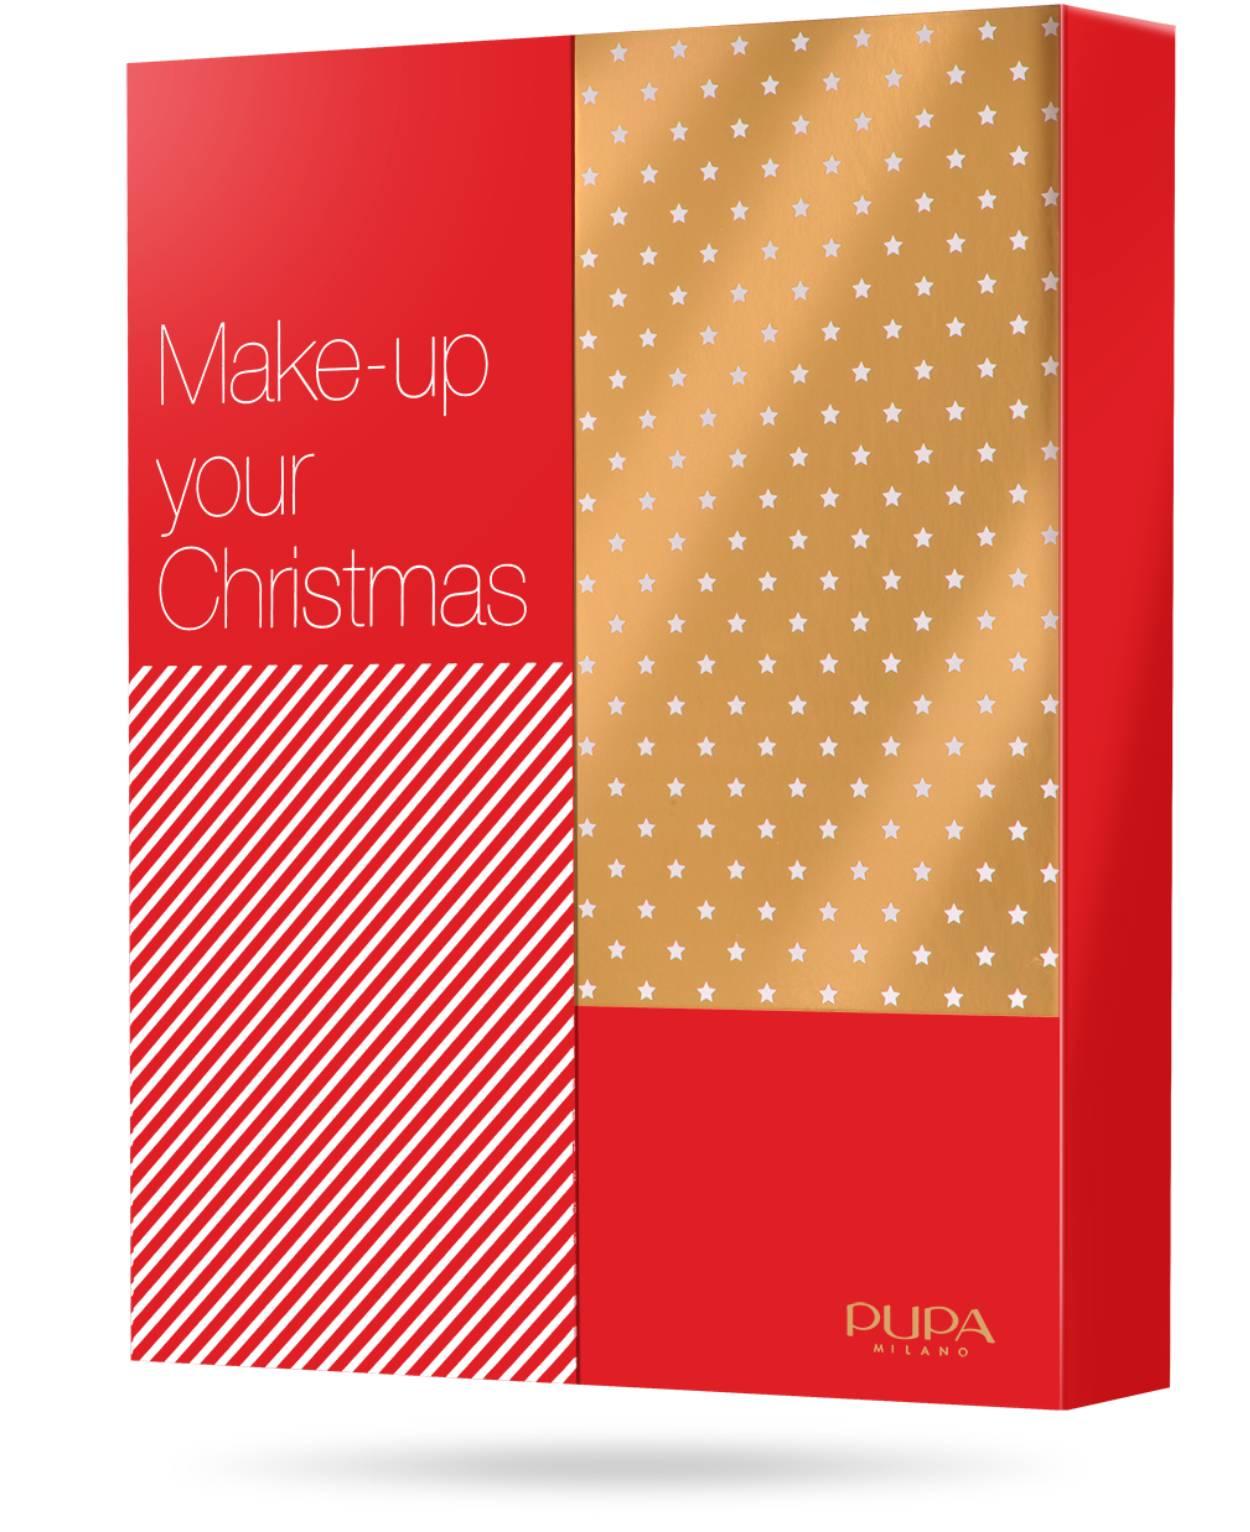 Calendario PUPA Milano 2021 Make Up Your Christmas